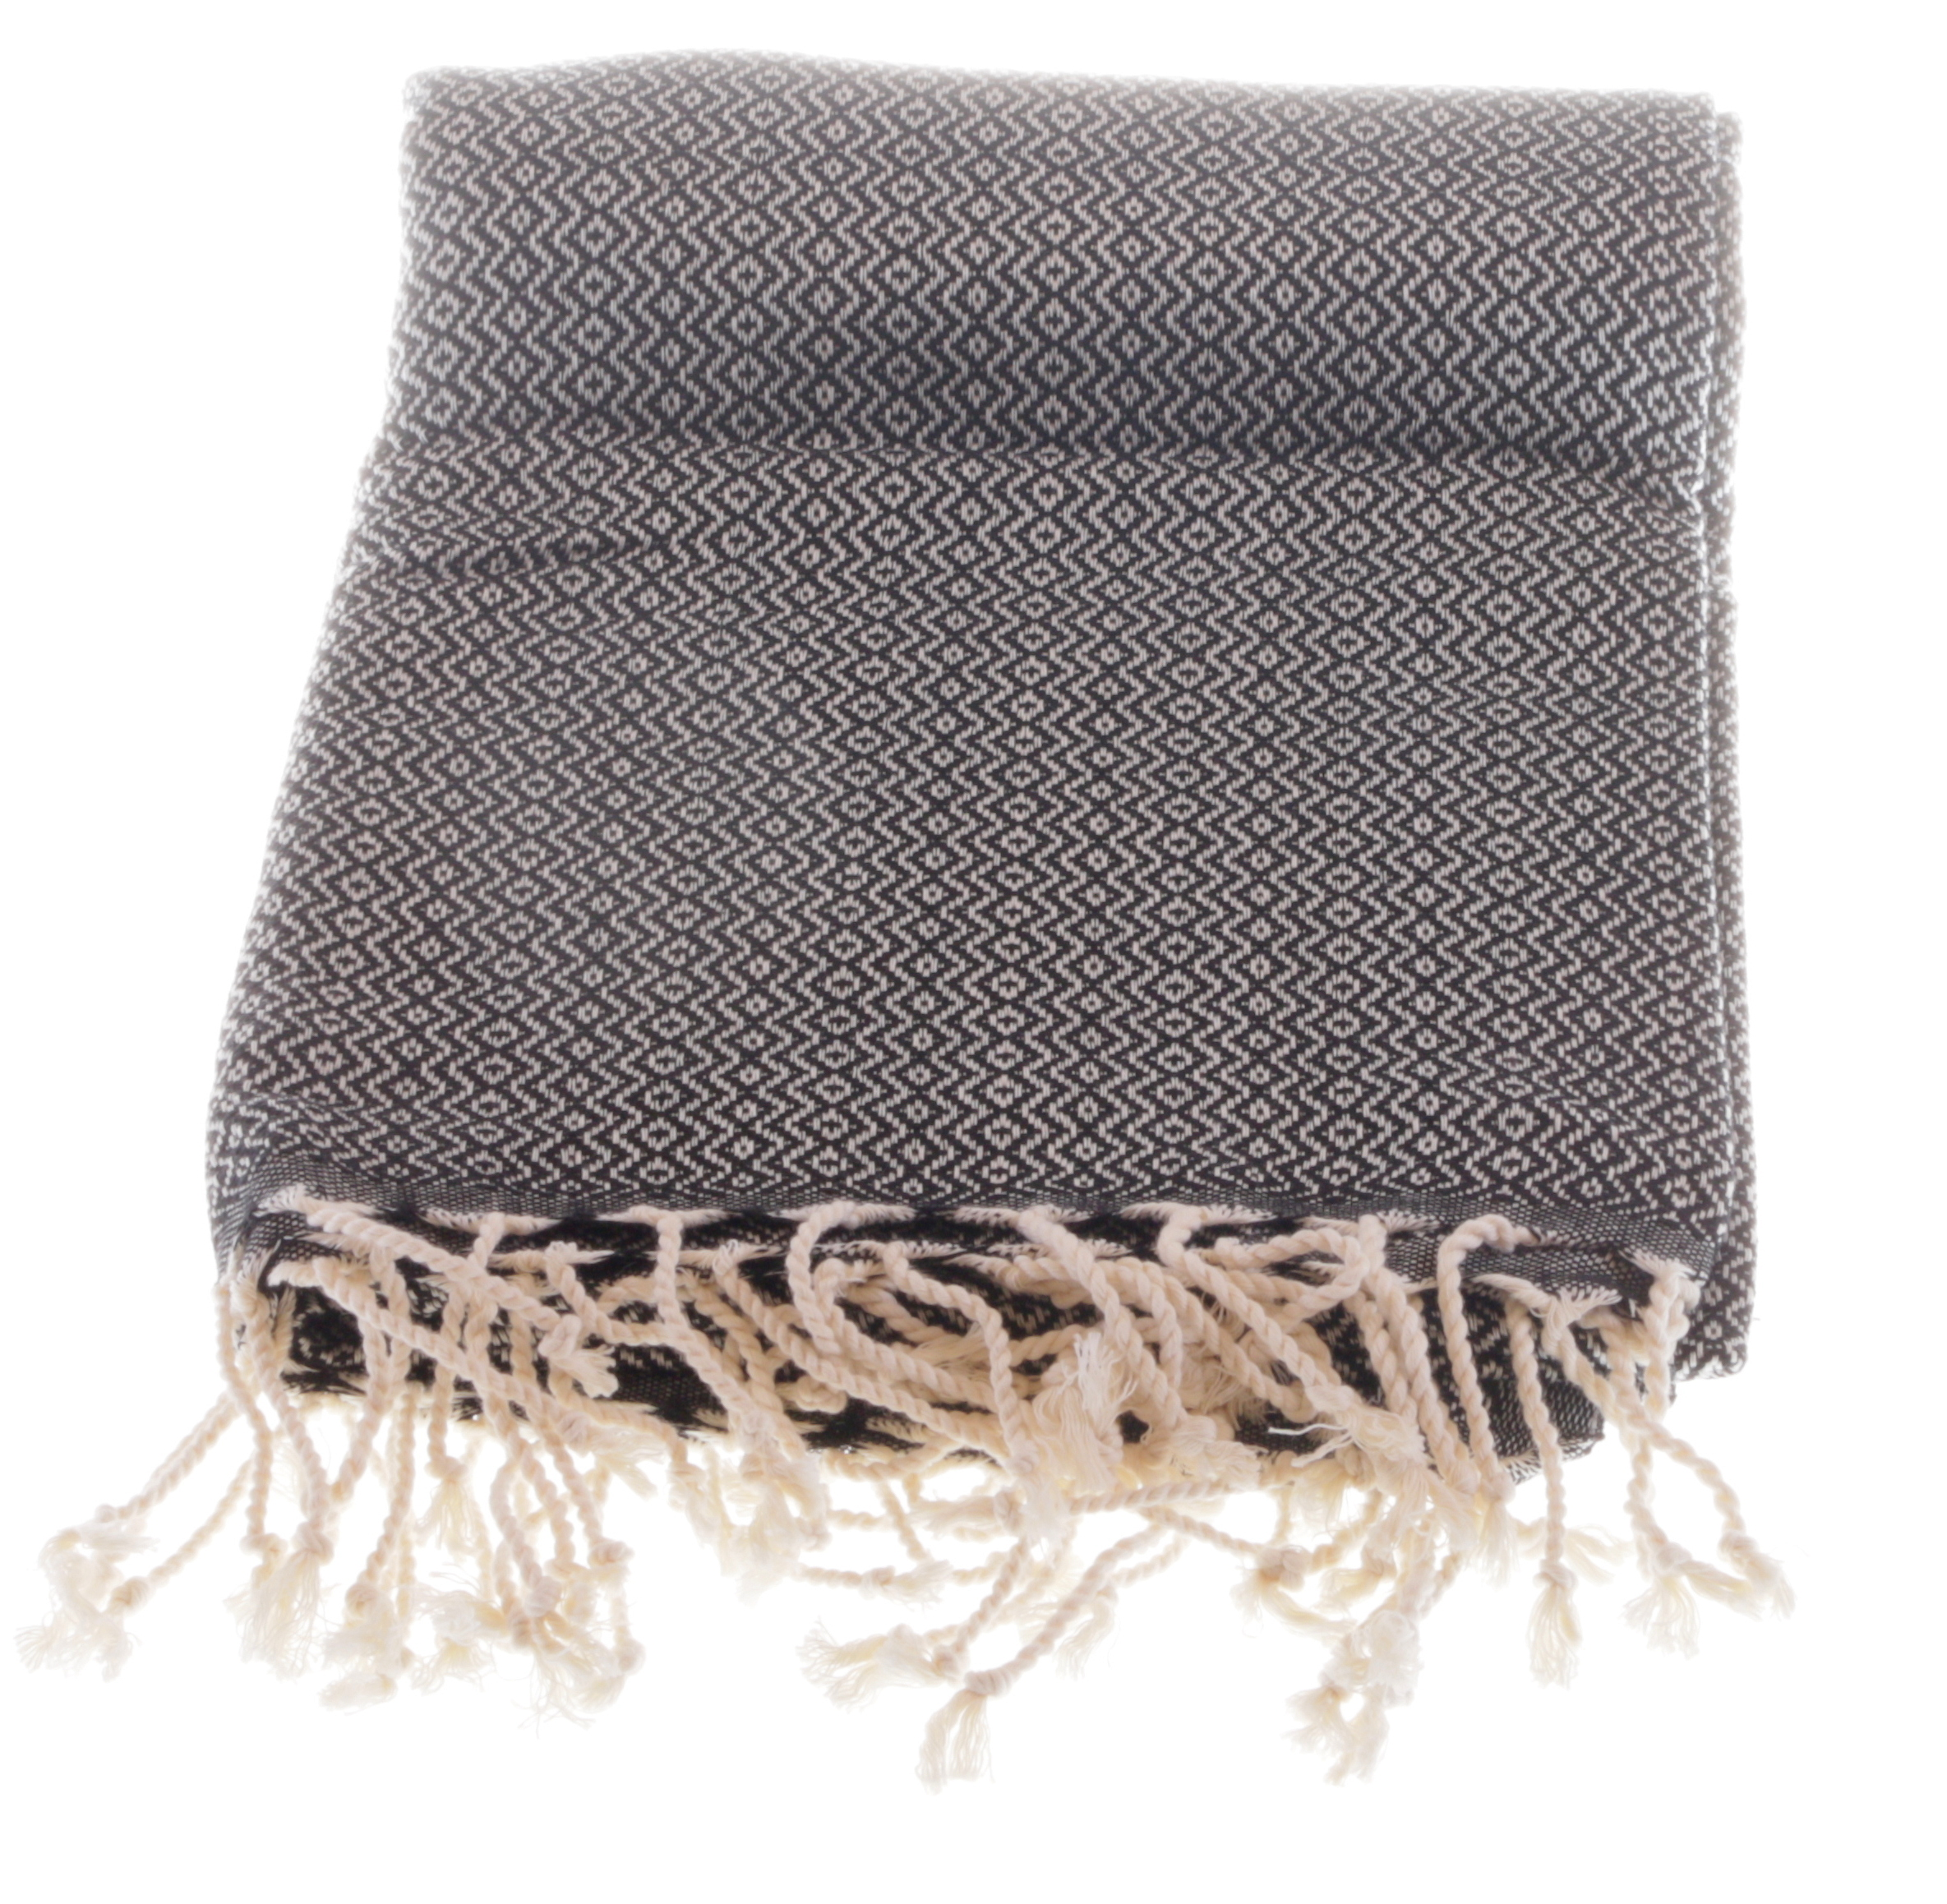 cotton-hammam-towel-kelim2-black